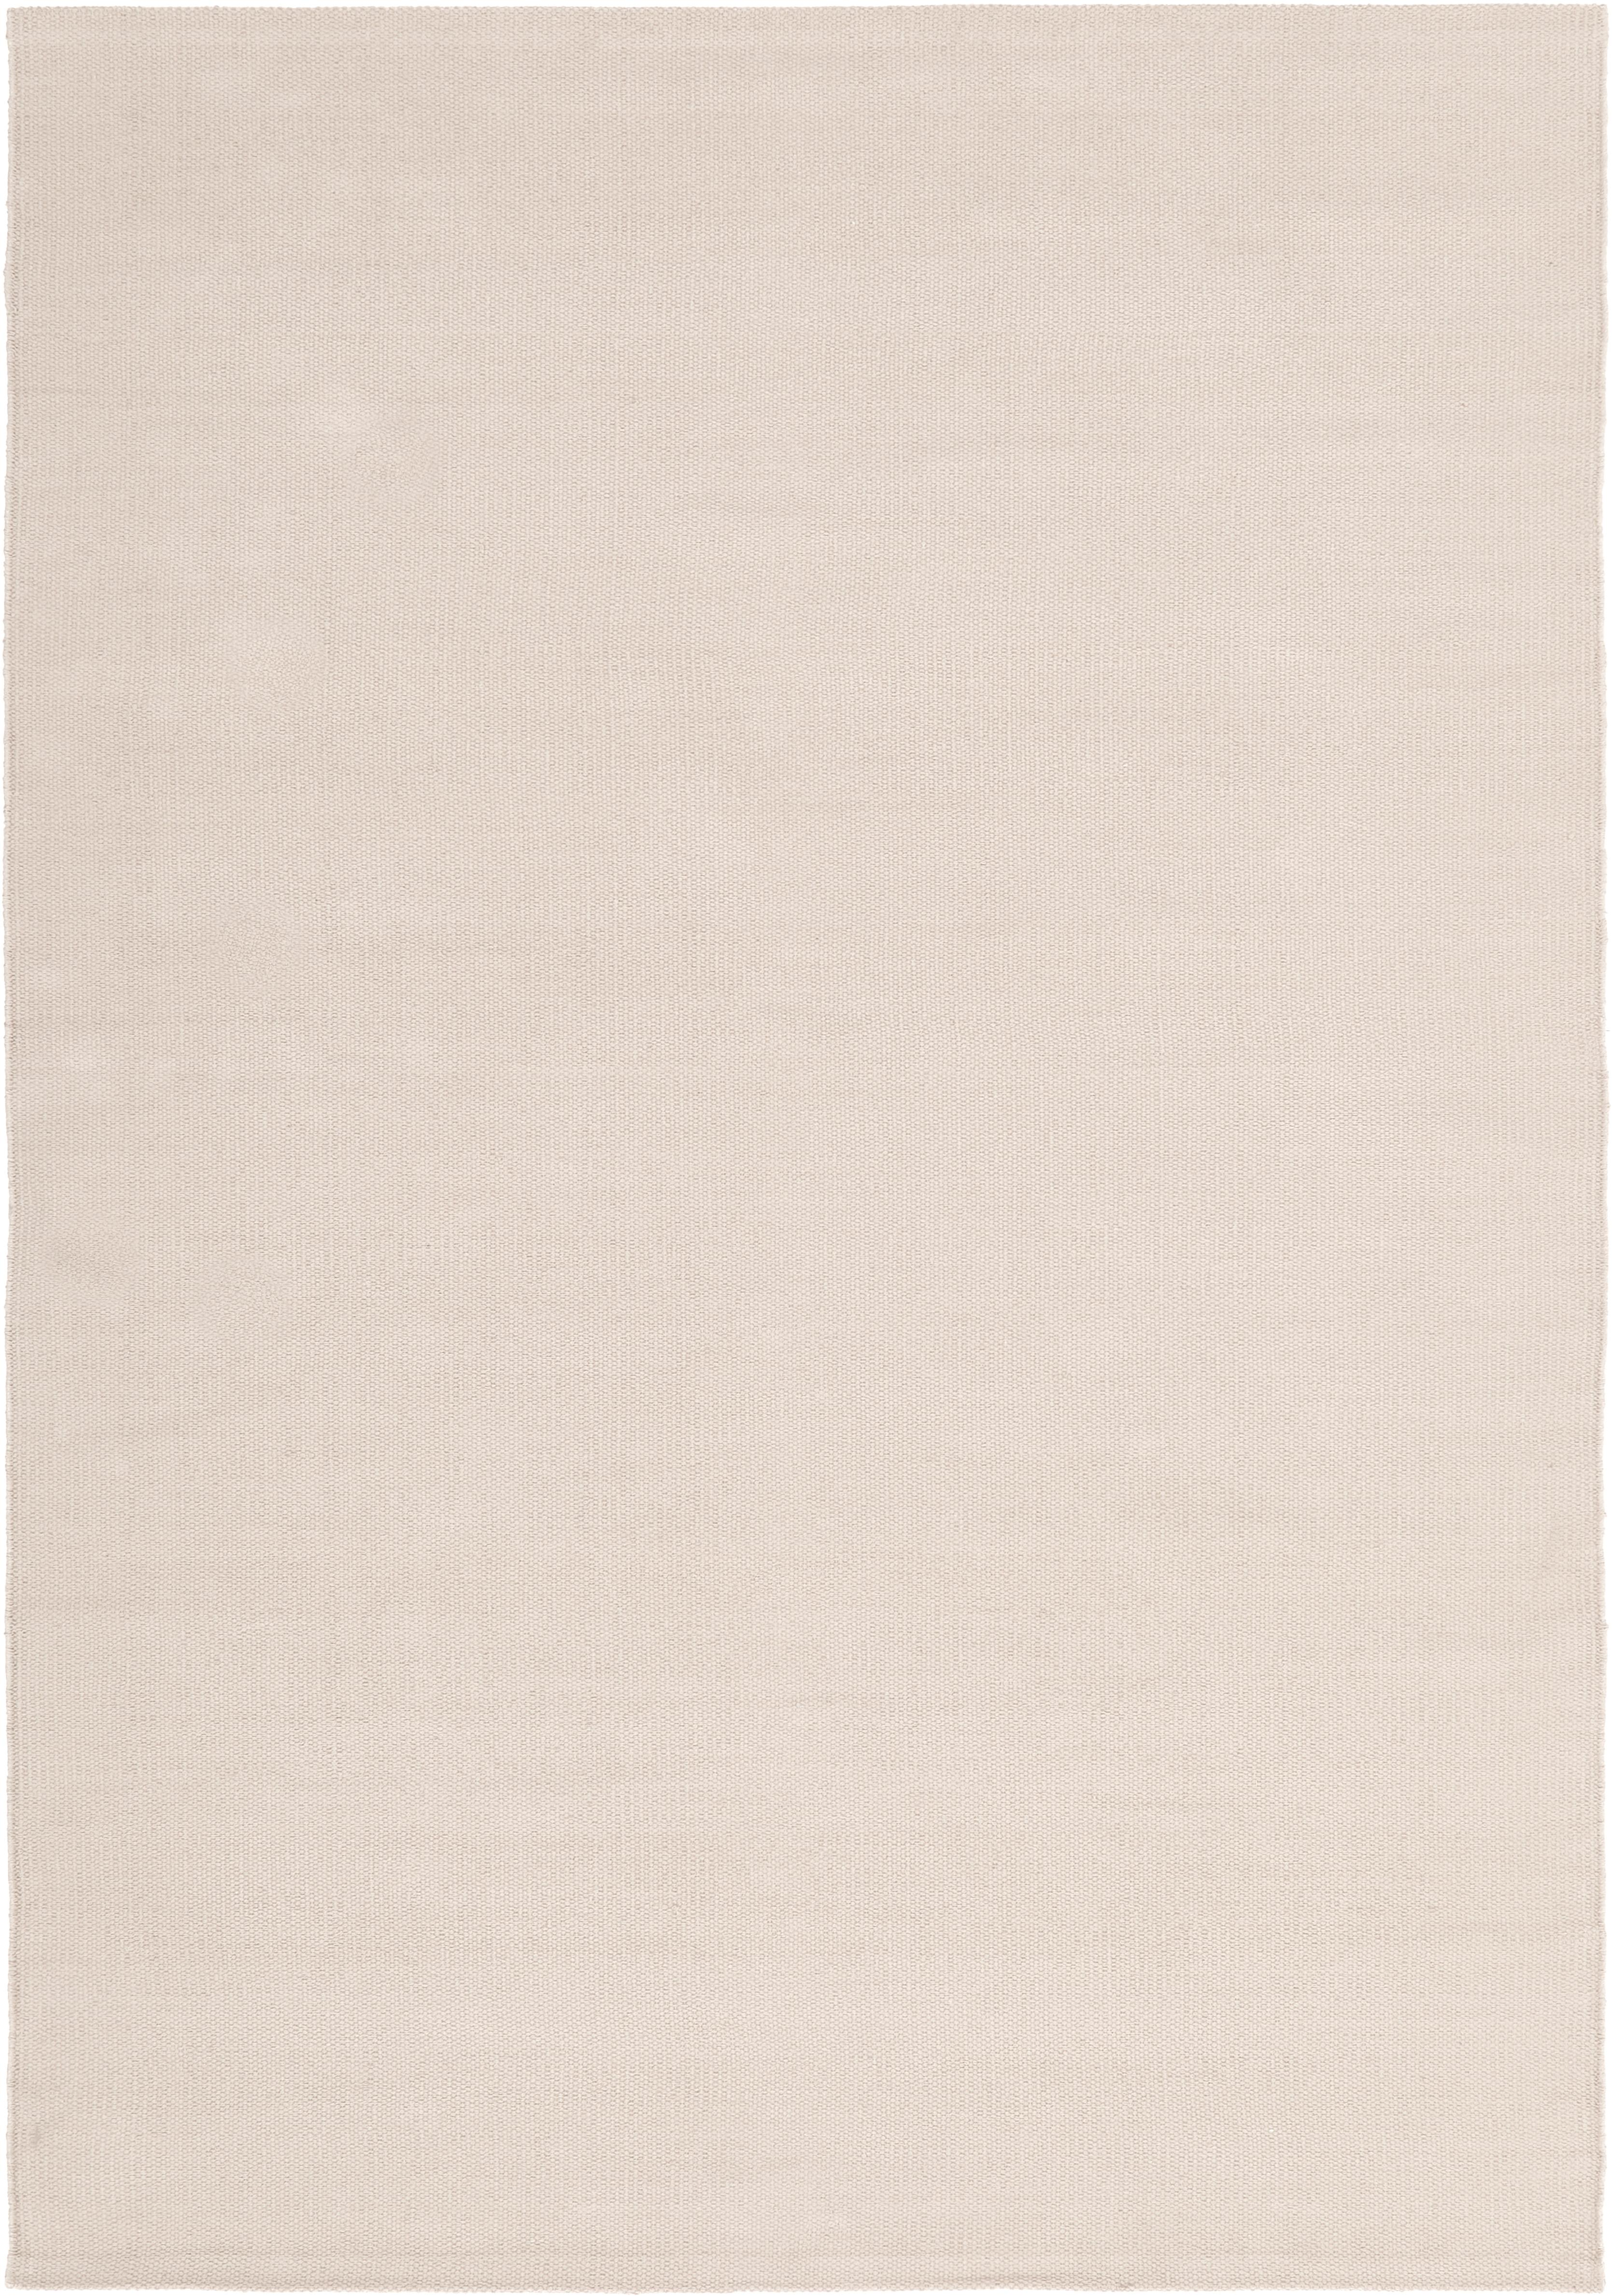 Tappeto in cotone tessuto a mano Agneta, Cotone, Taupe, Larg. 160 x Lung. 230 cm